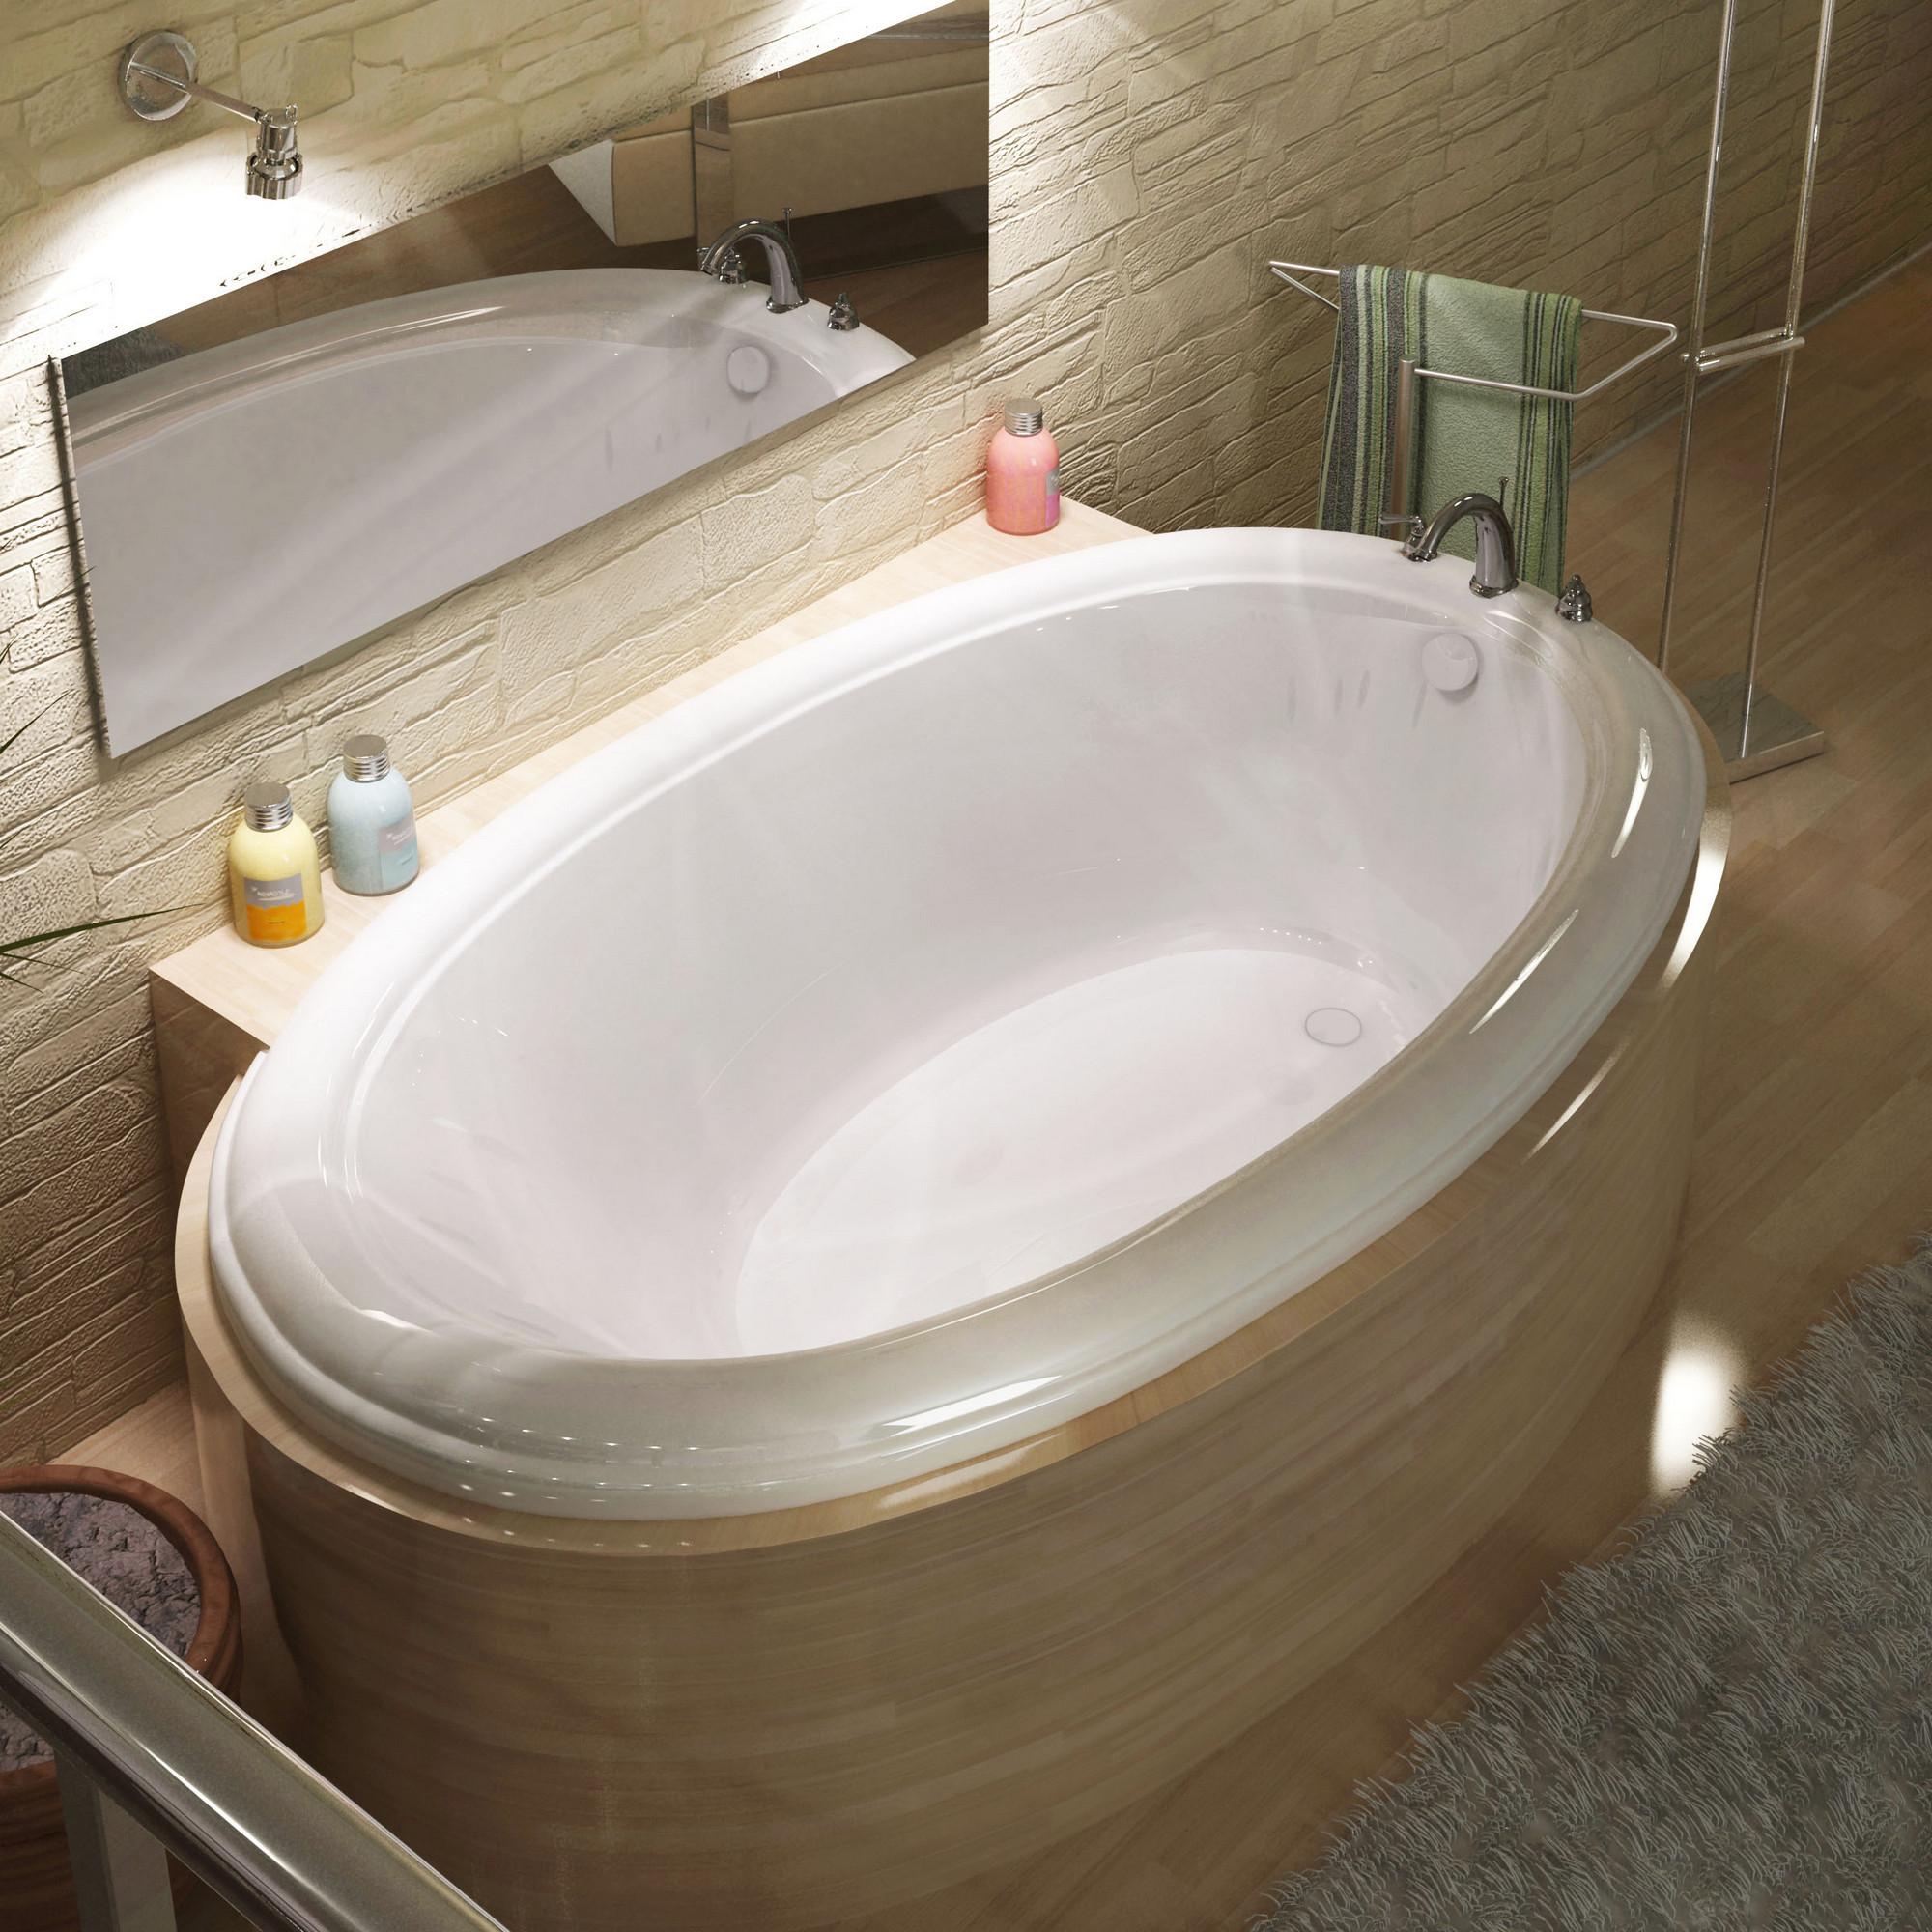 MediTub 4478PC Atlantis Petite 44 x 78 Drop In Oval Soaking Bathtub